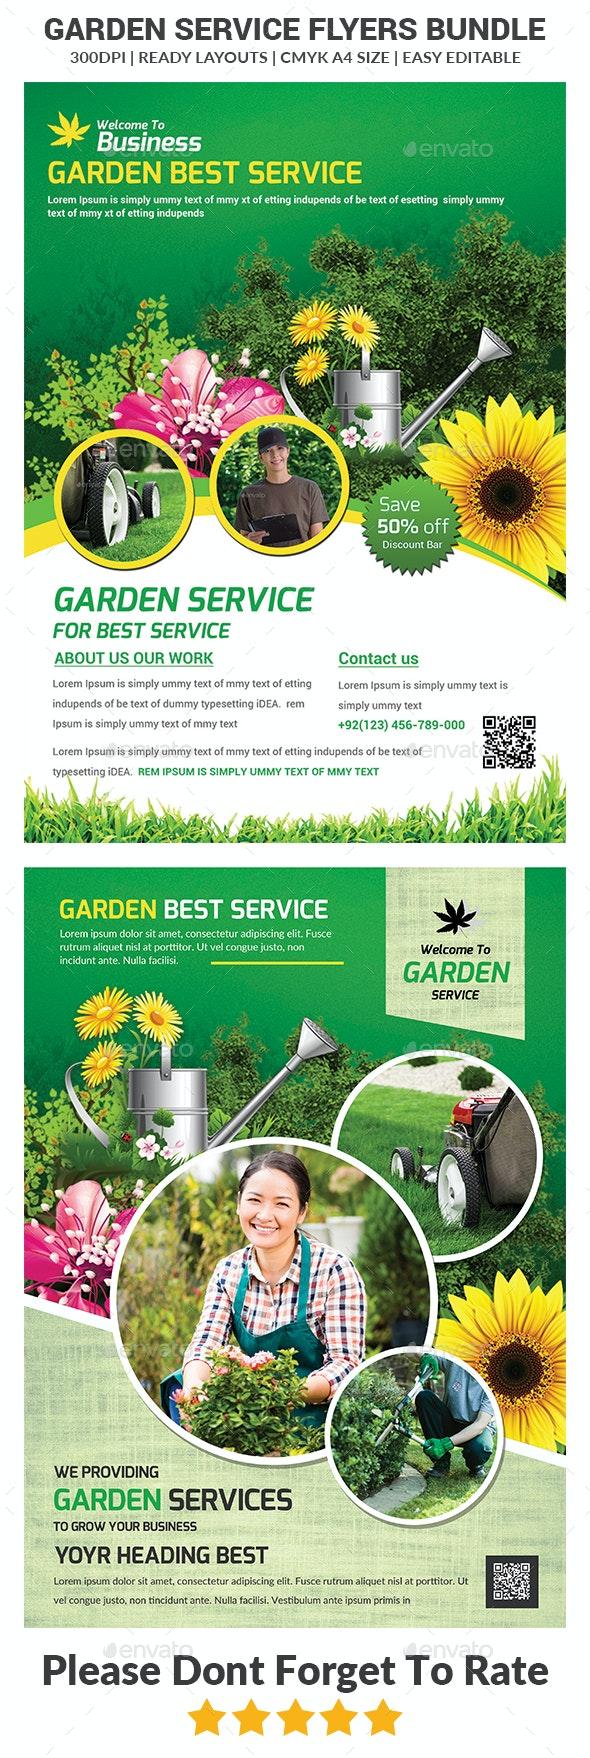 Garden Services Flyers Bundle - Corporate Flyers